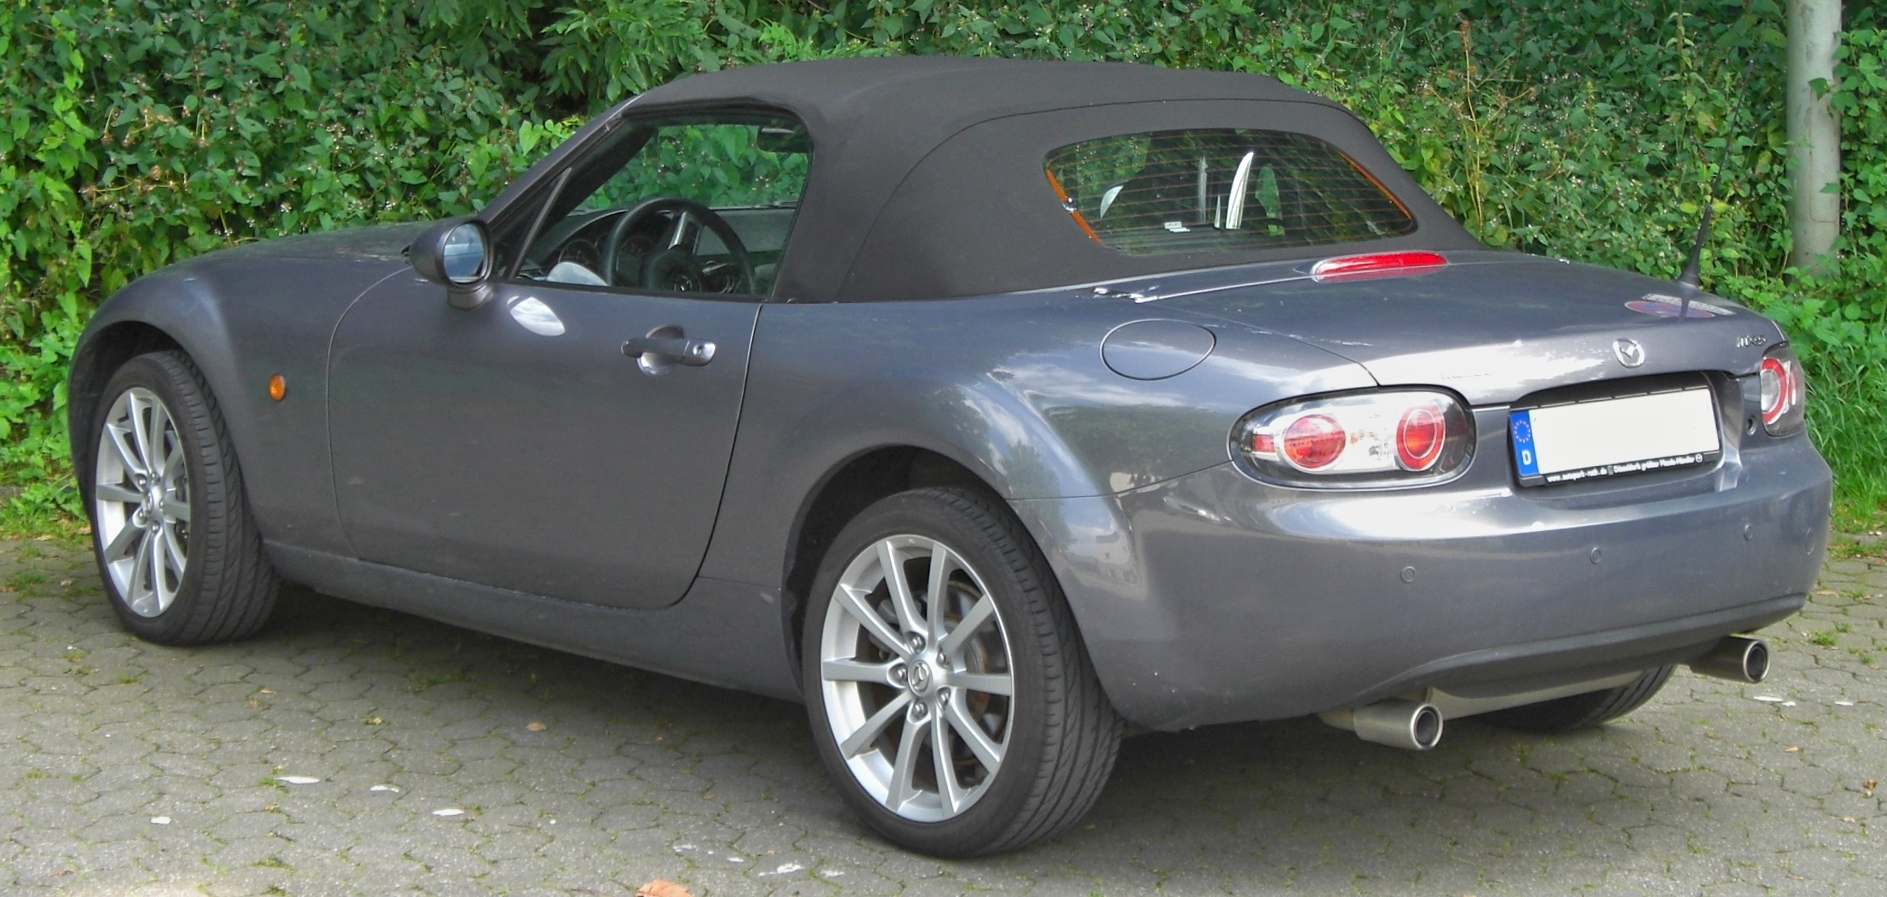 File:Mazda MX-5 III rear.JPG - Wikimedia Commons